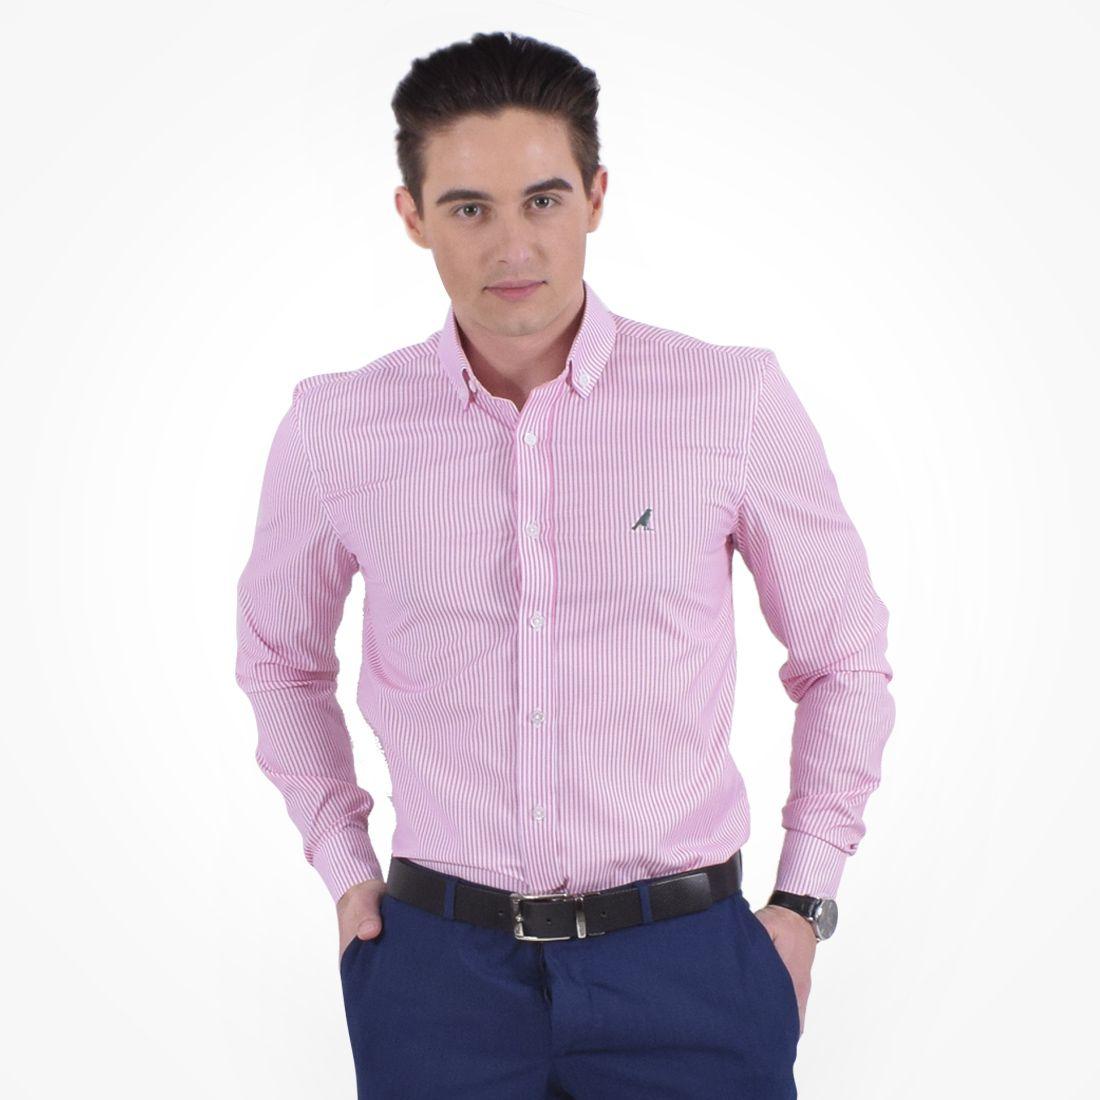 100212 - Camisa Social Listrada Masculina Slim Rosa - LEVOK